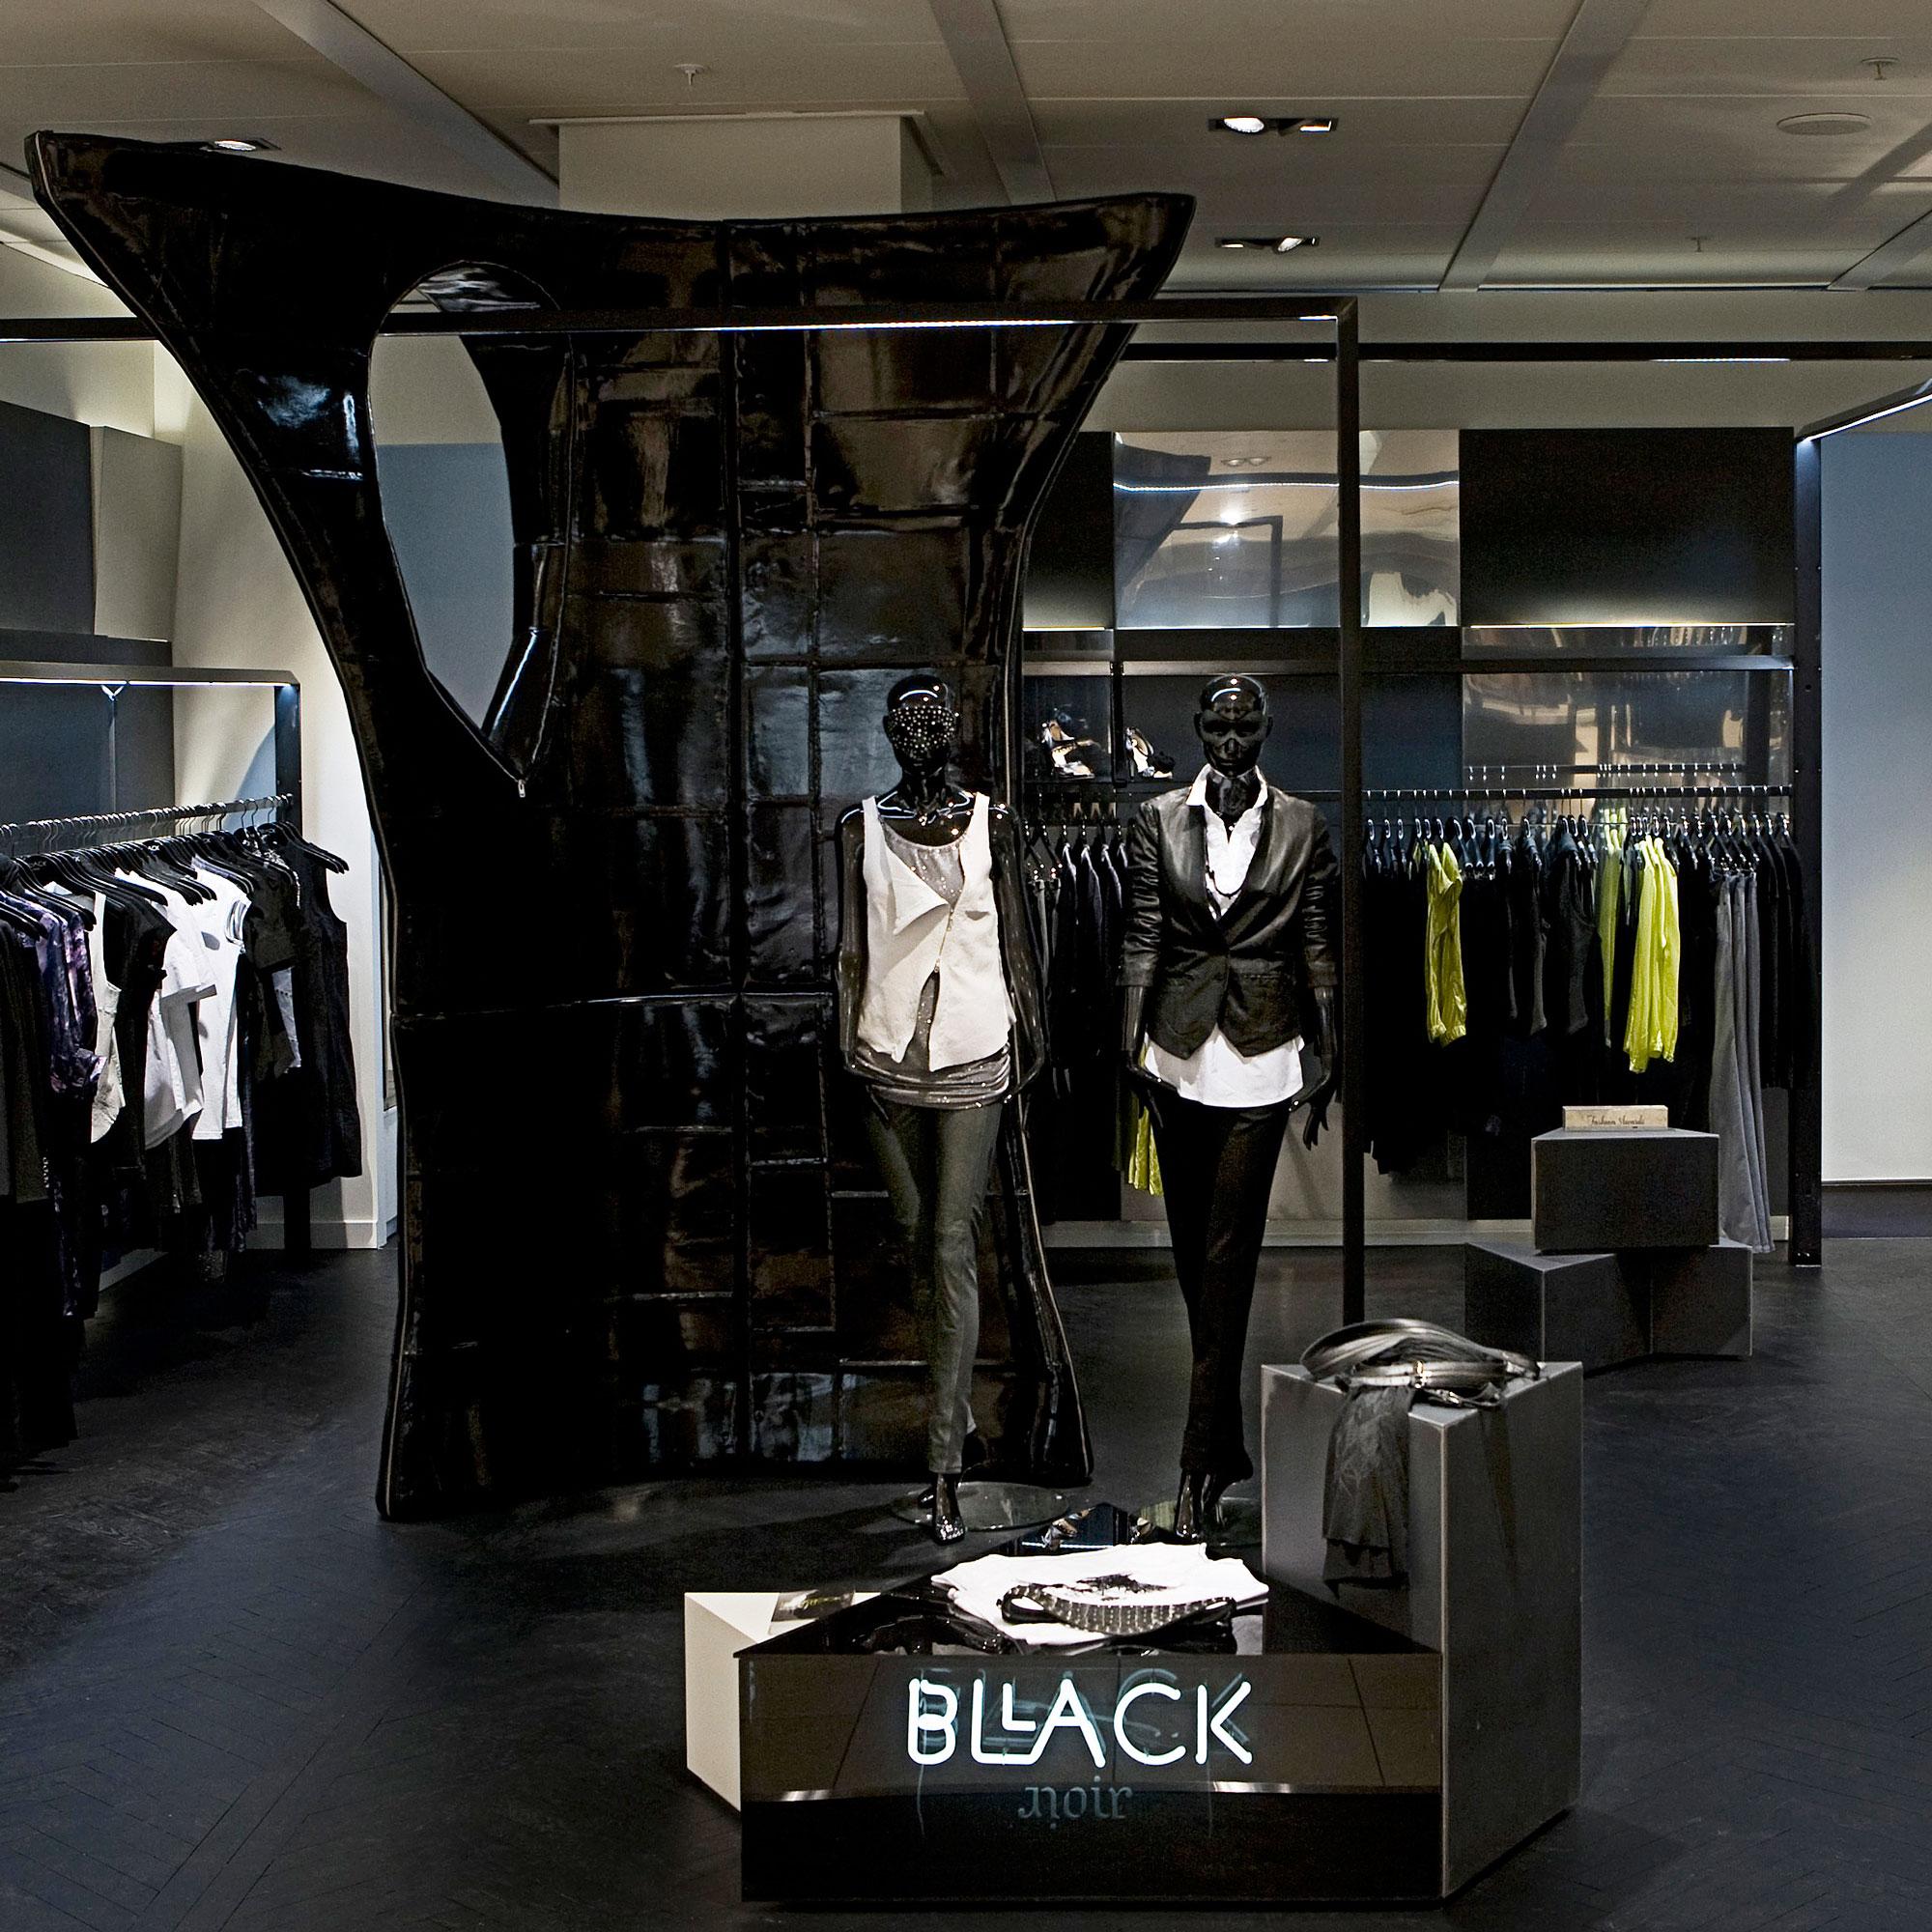 Interior design of luxury-clothing brand Bllack Noir at the retail store located in Copenhagen